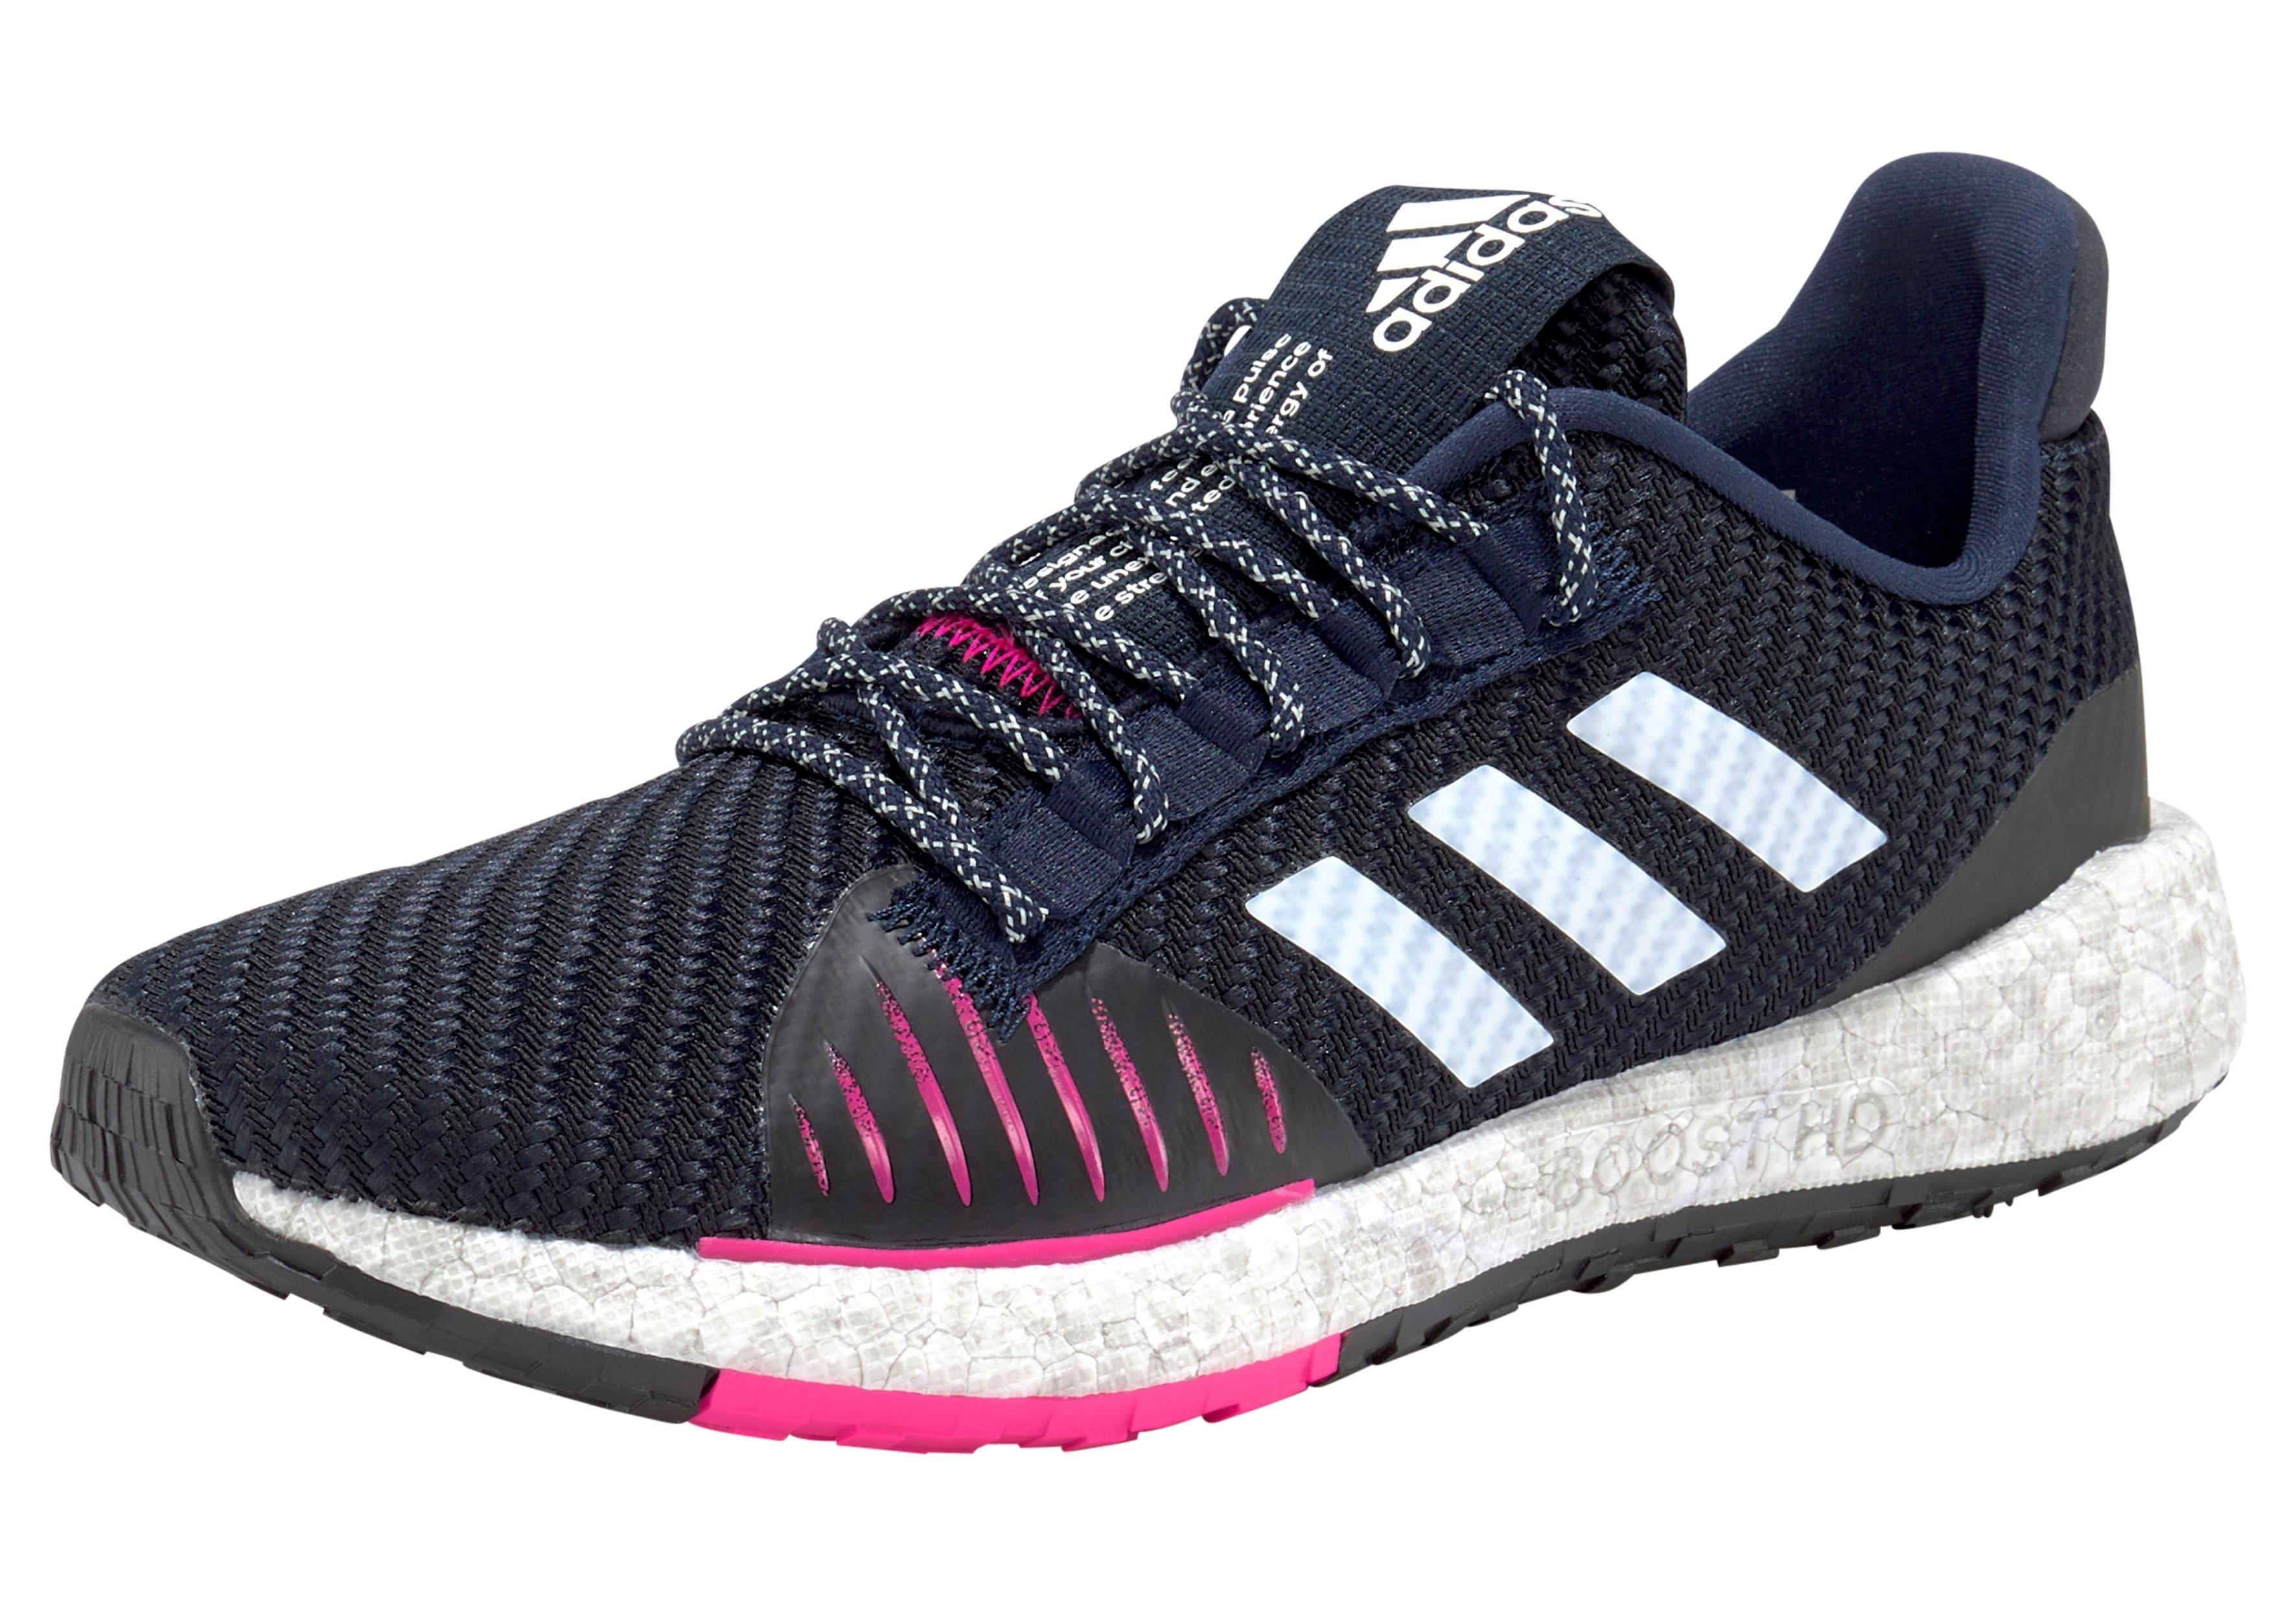 adidas Performance runningschoenen »Pulse Boost HD Guard« goedkoop op otto.nl kopen